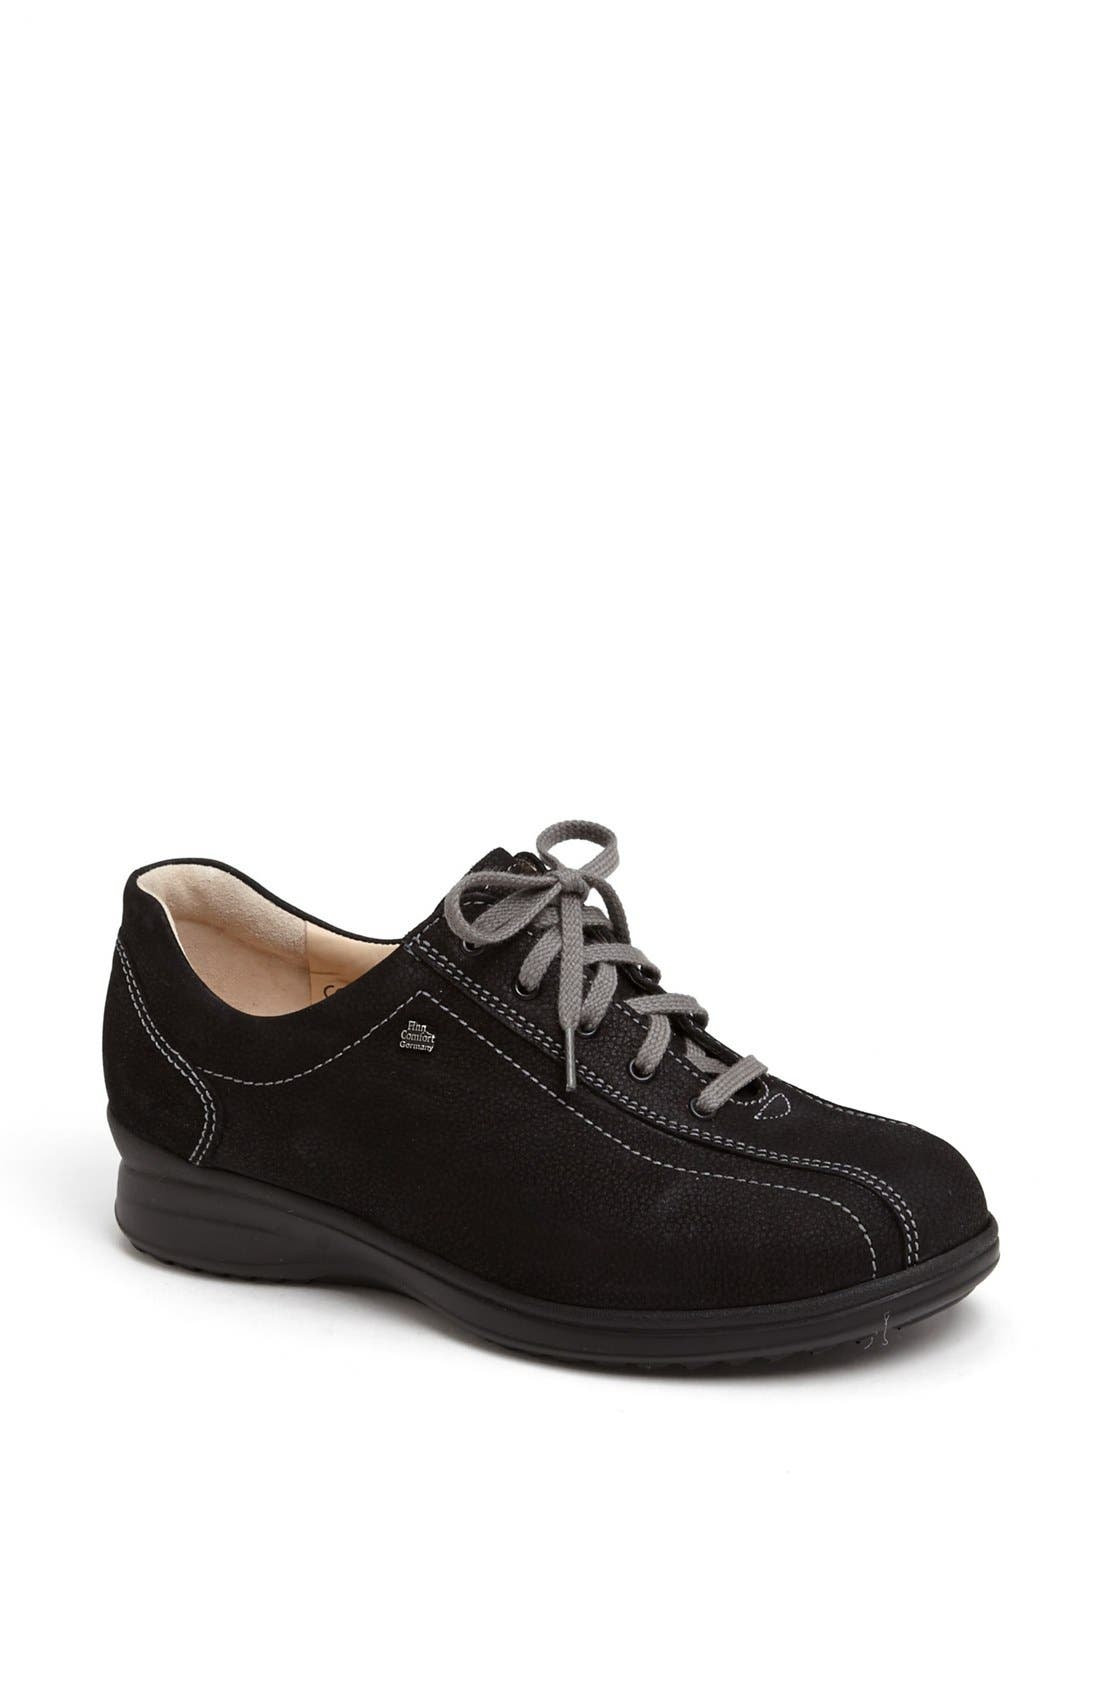 Alternate Image 1 Selected - Finn Comfort 'Almeria' Sneaker